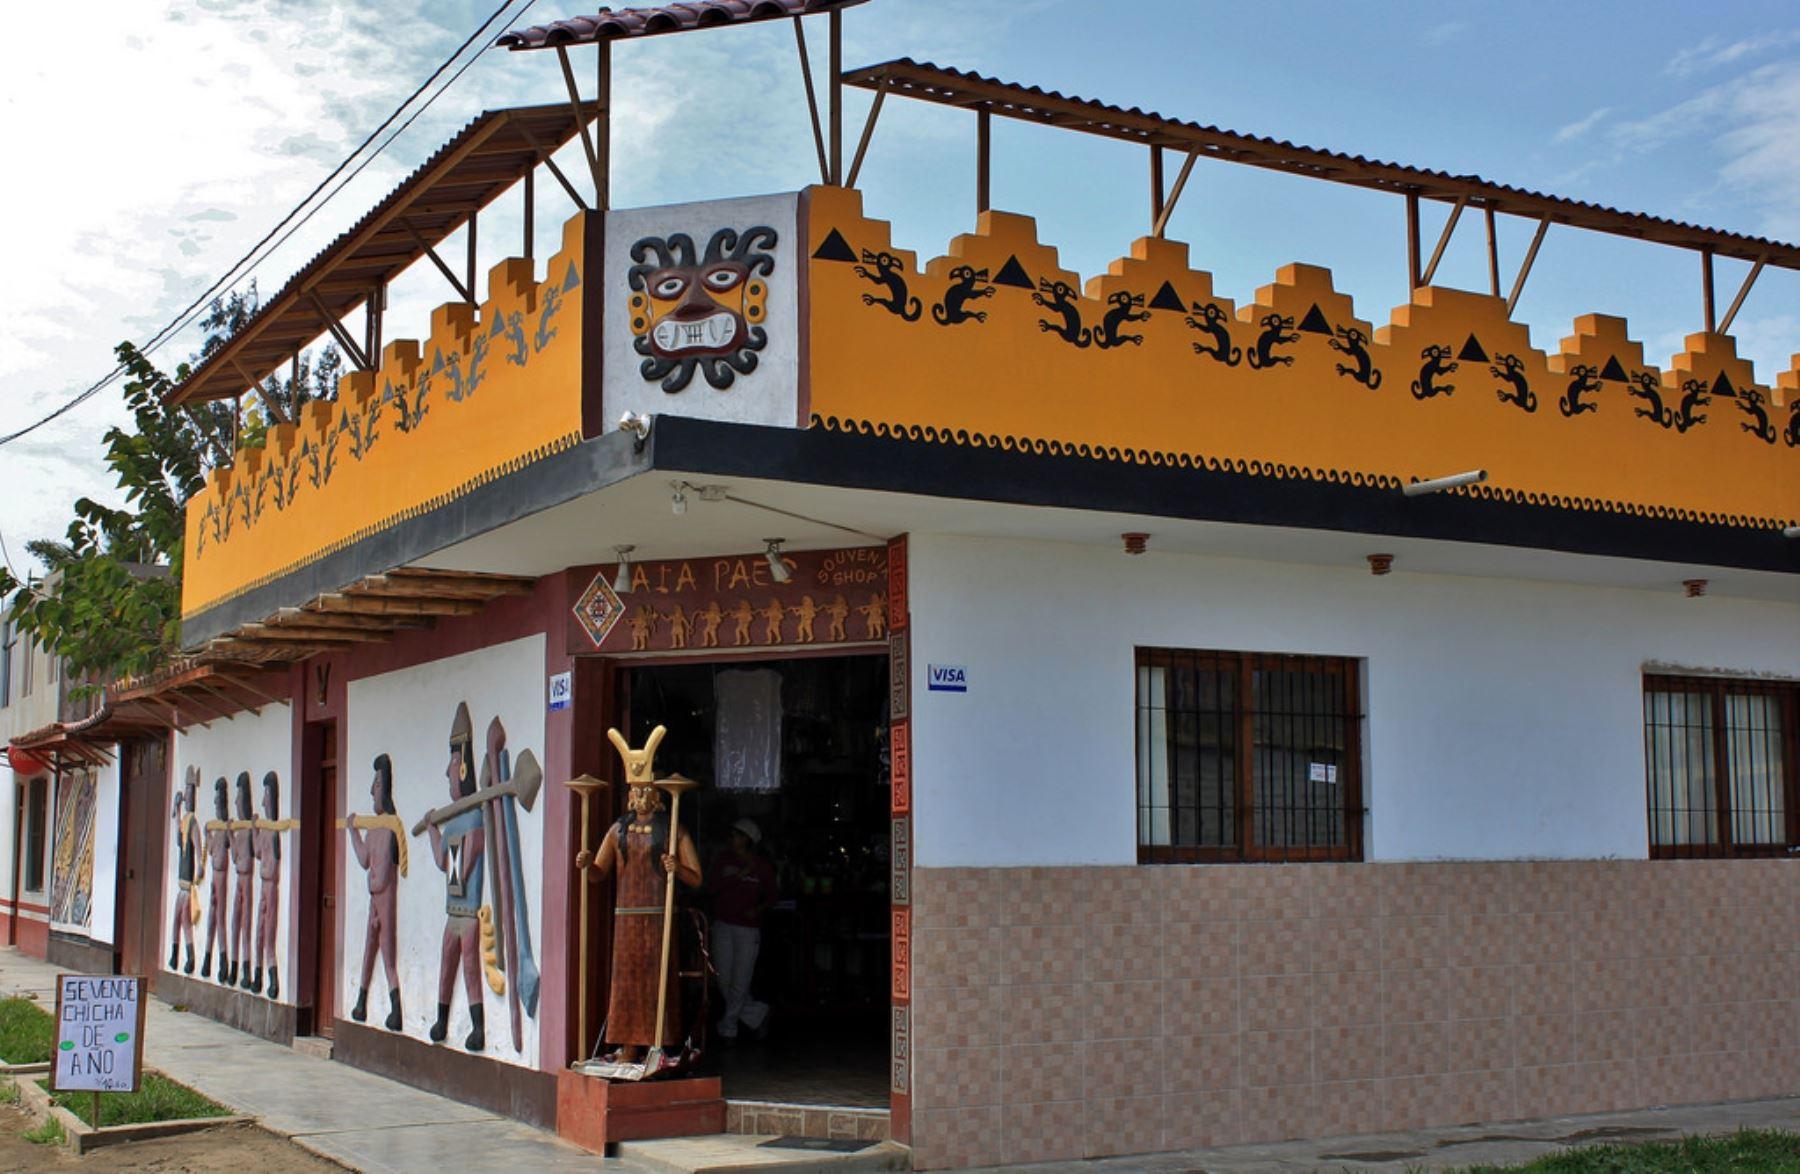 Mincetur ejecutó diversas obras de mejoramiento e interés turístico en Magdalena de Cao, La Libertad. ANDINA